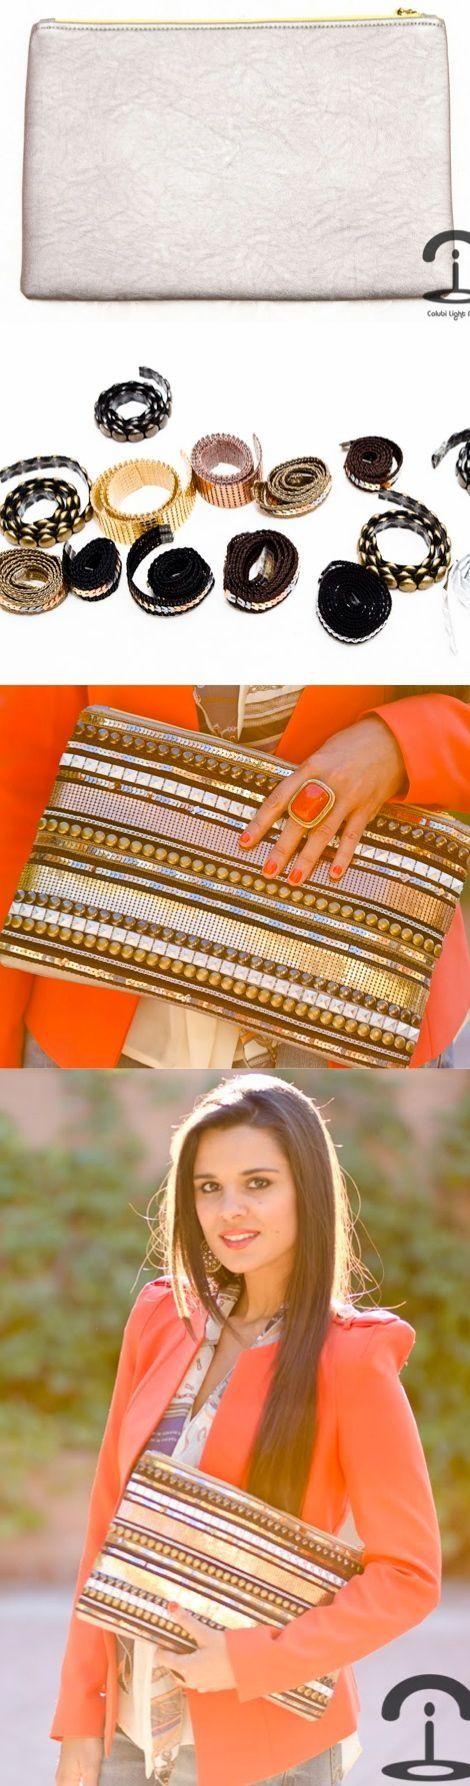 DIY Crimenes de la Moda - Metallic embellished handbag - cartera metalizada…